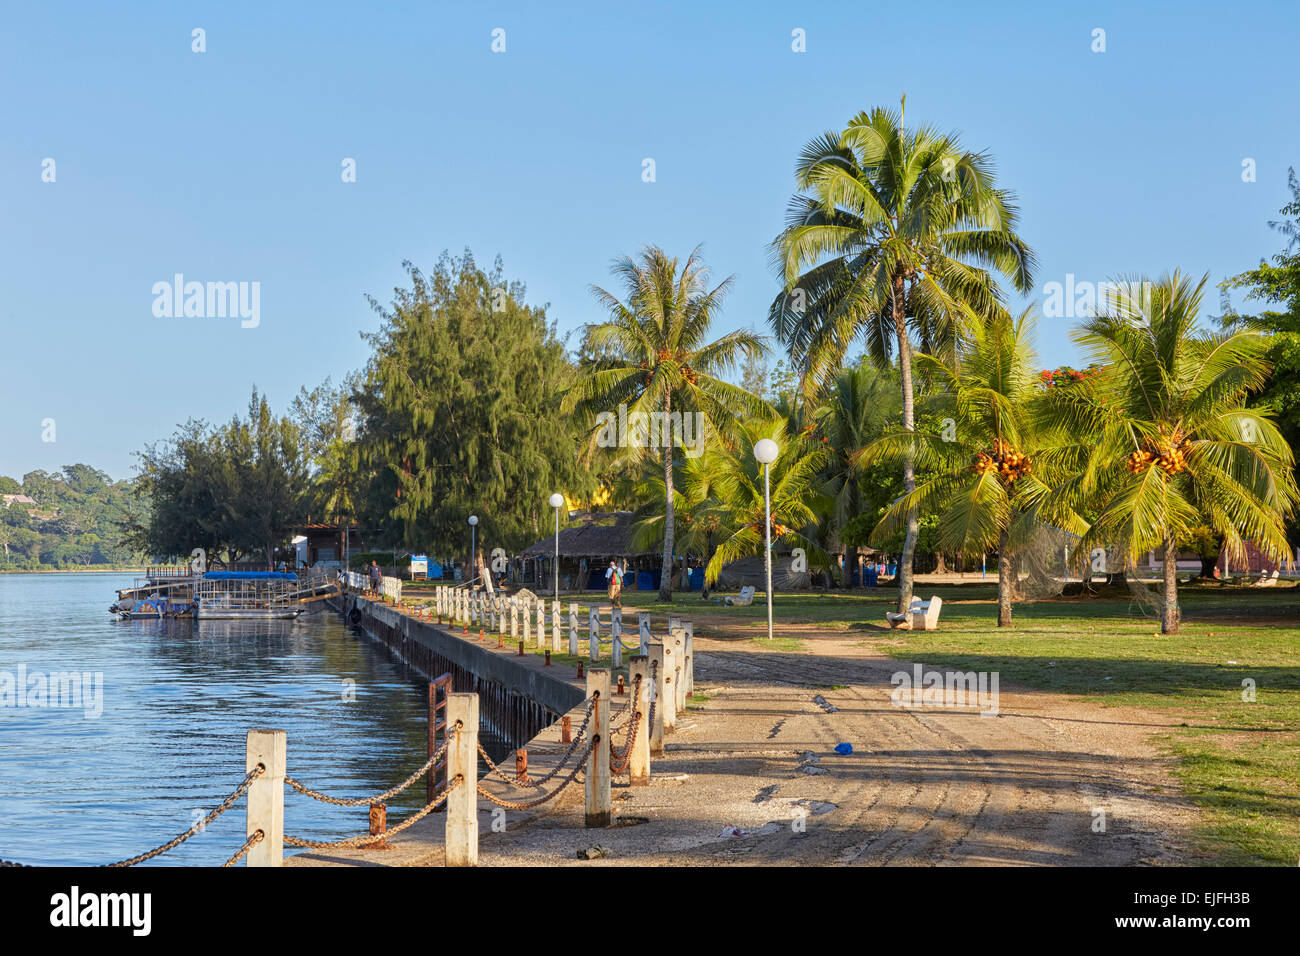 Waterfront Park, Port Vila, Efate Island, Vanuatu - Stock Image